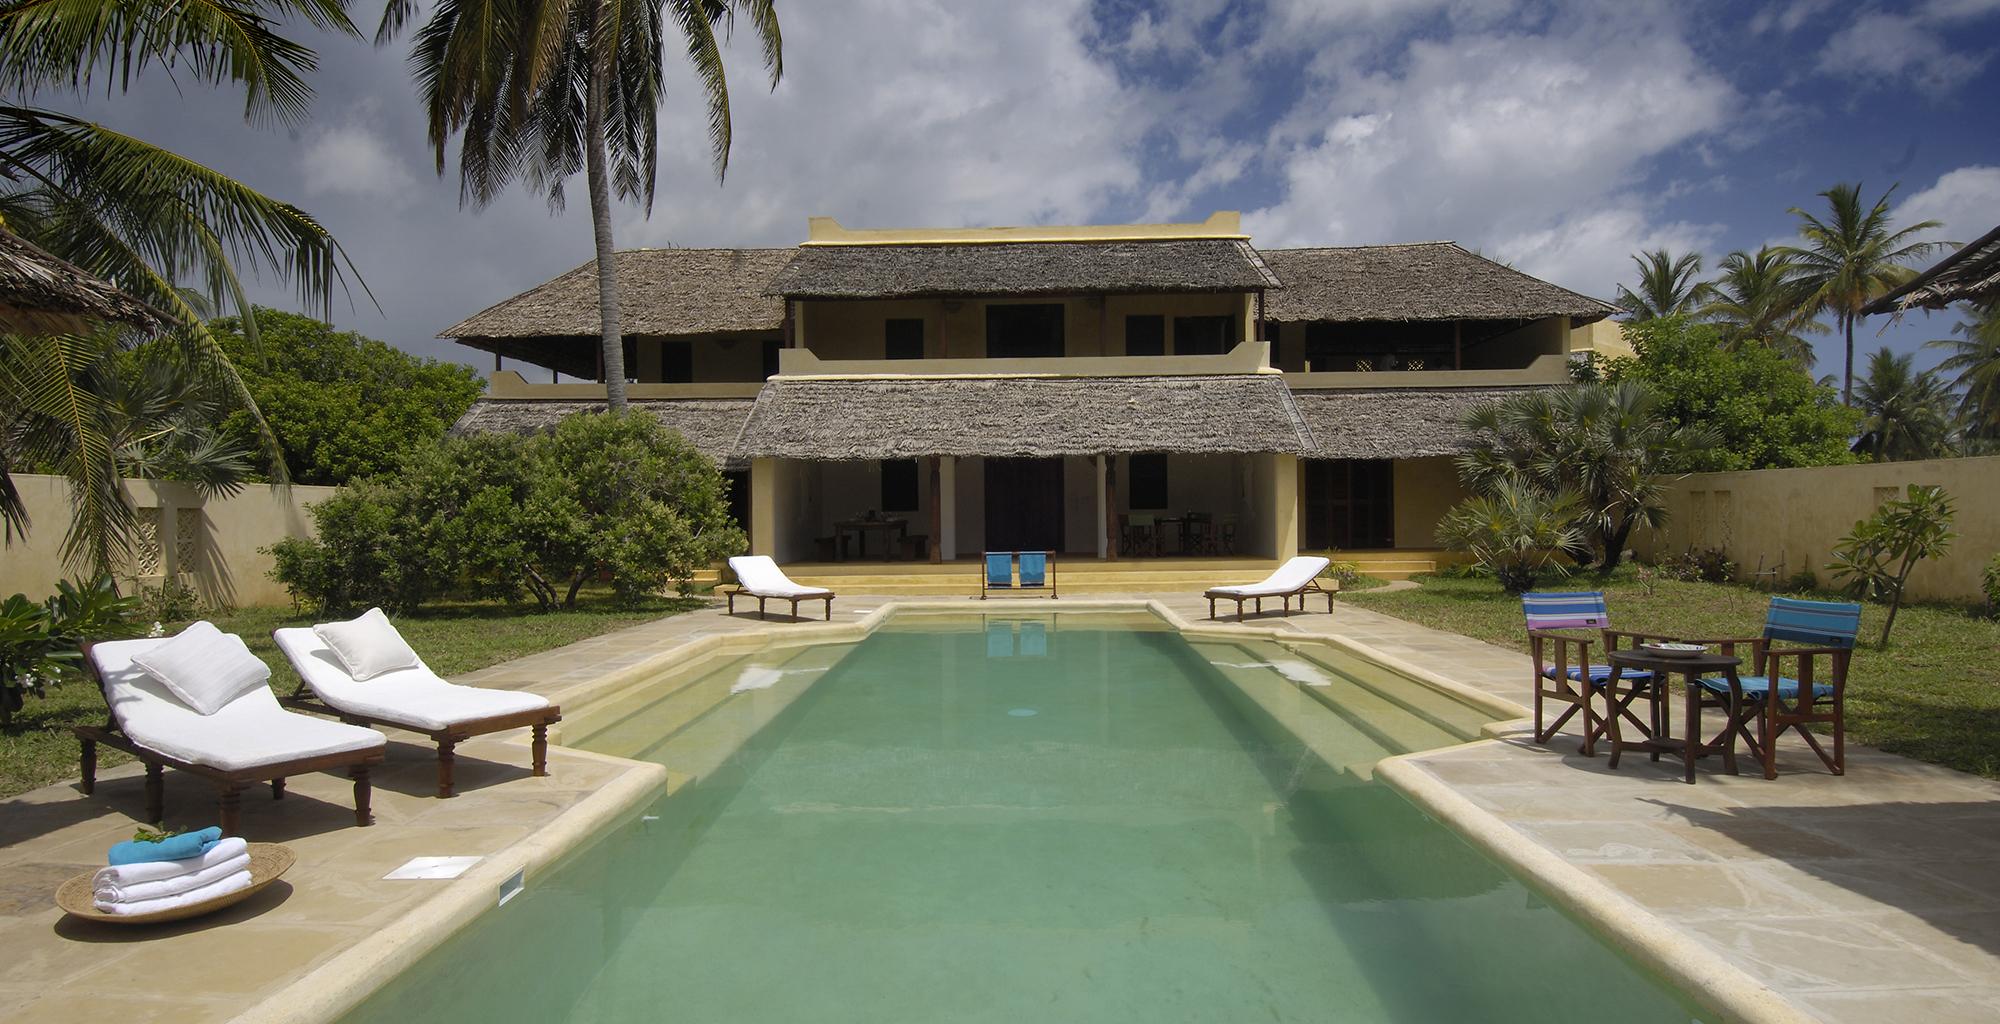 Kenya-Kizingoni-Villa-Exterior